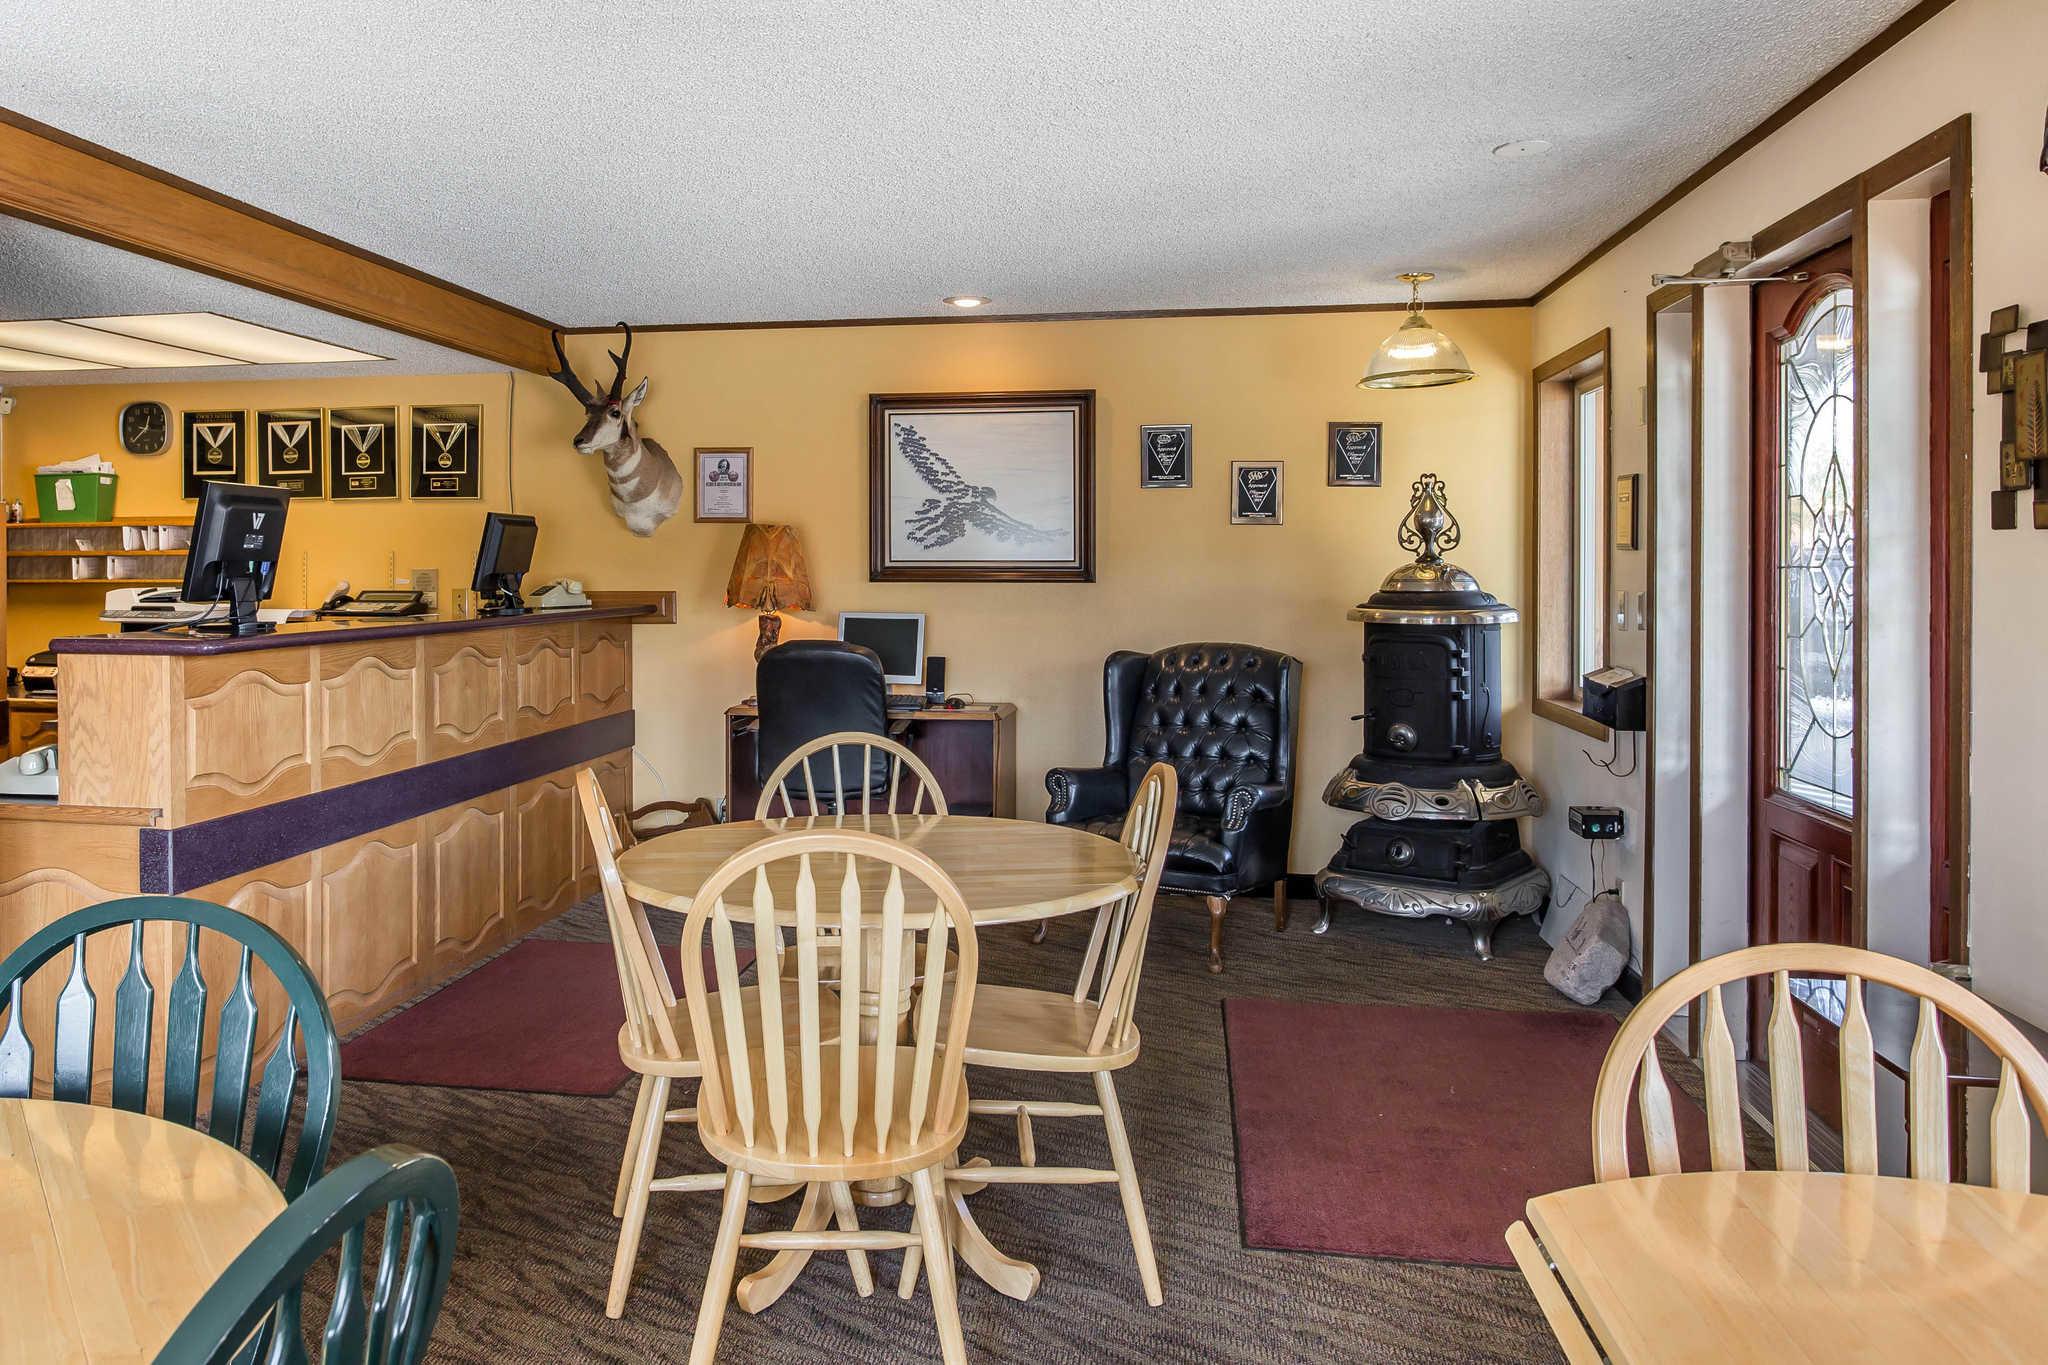 Rodeway Inn Pronghorn Lodge image 31